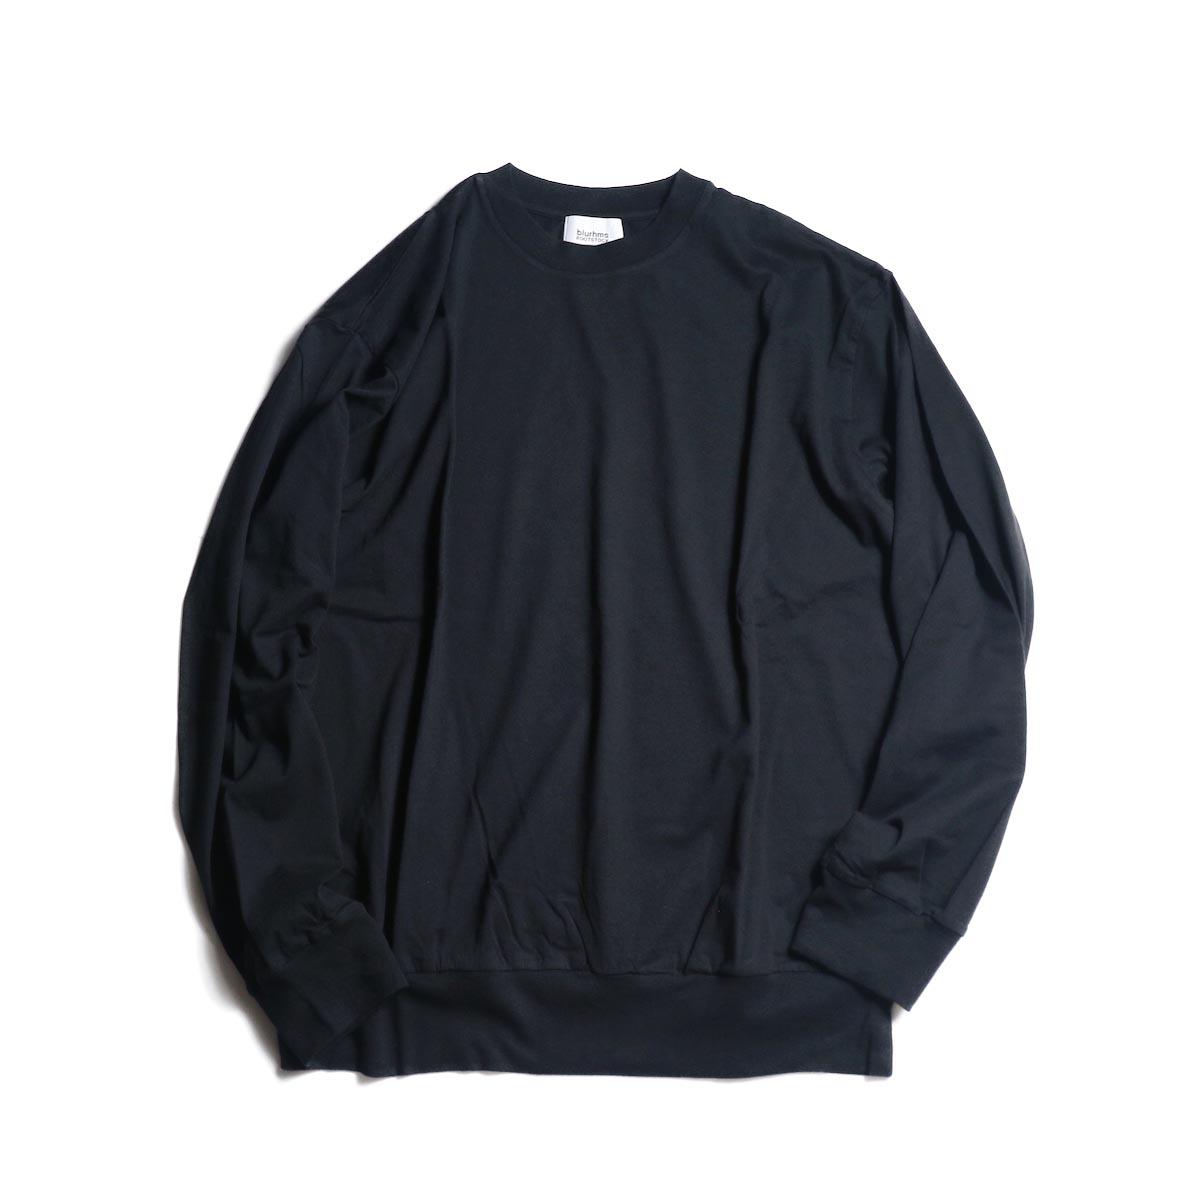 blurhms / Silk Cotton Jersey L/S P/O Loose Fit (Black)正面